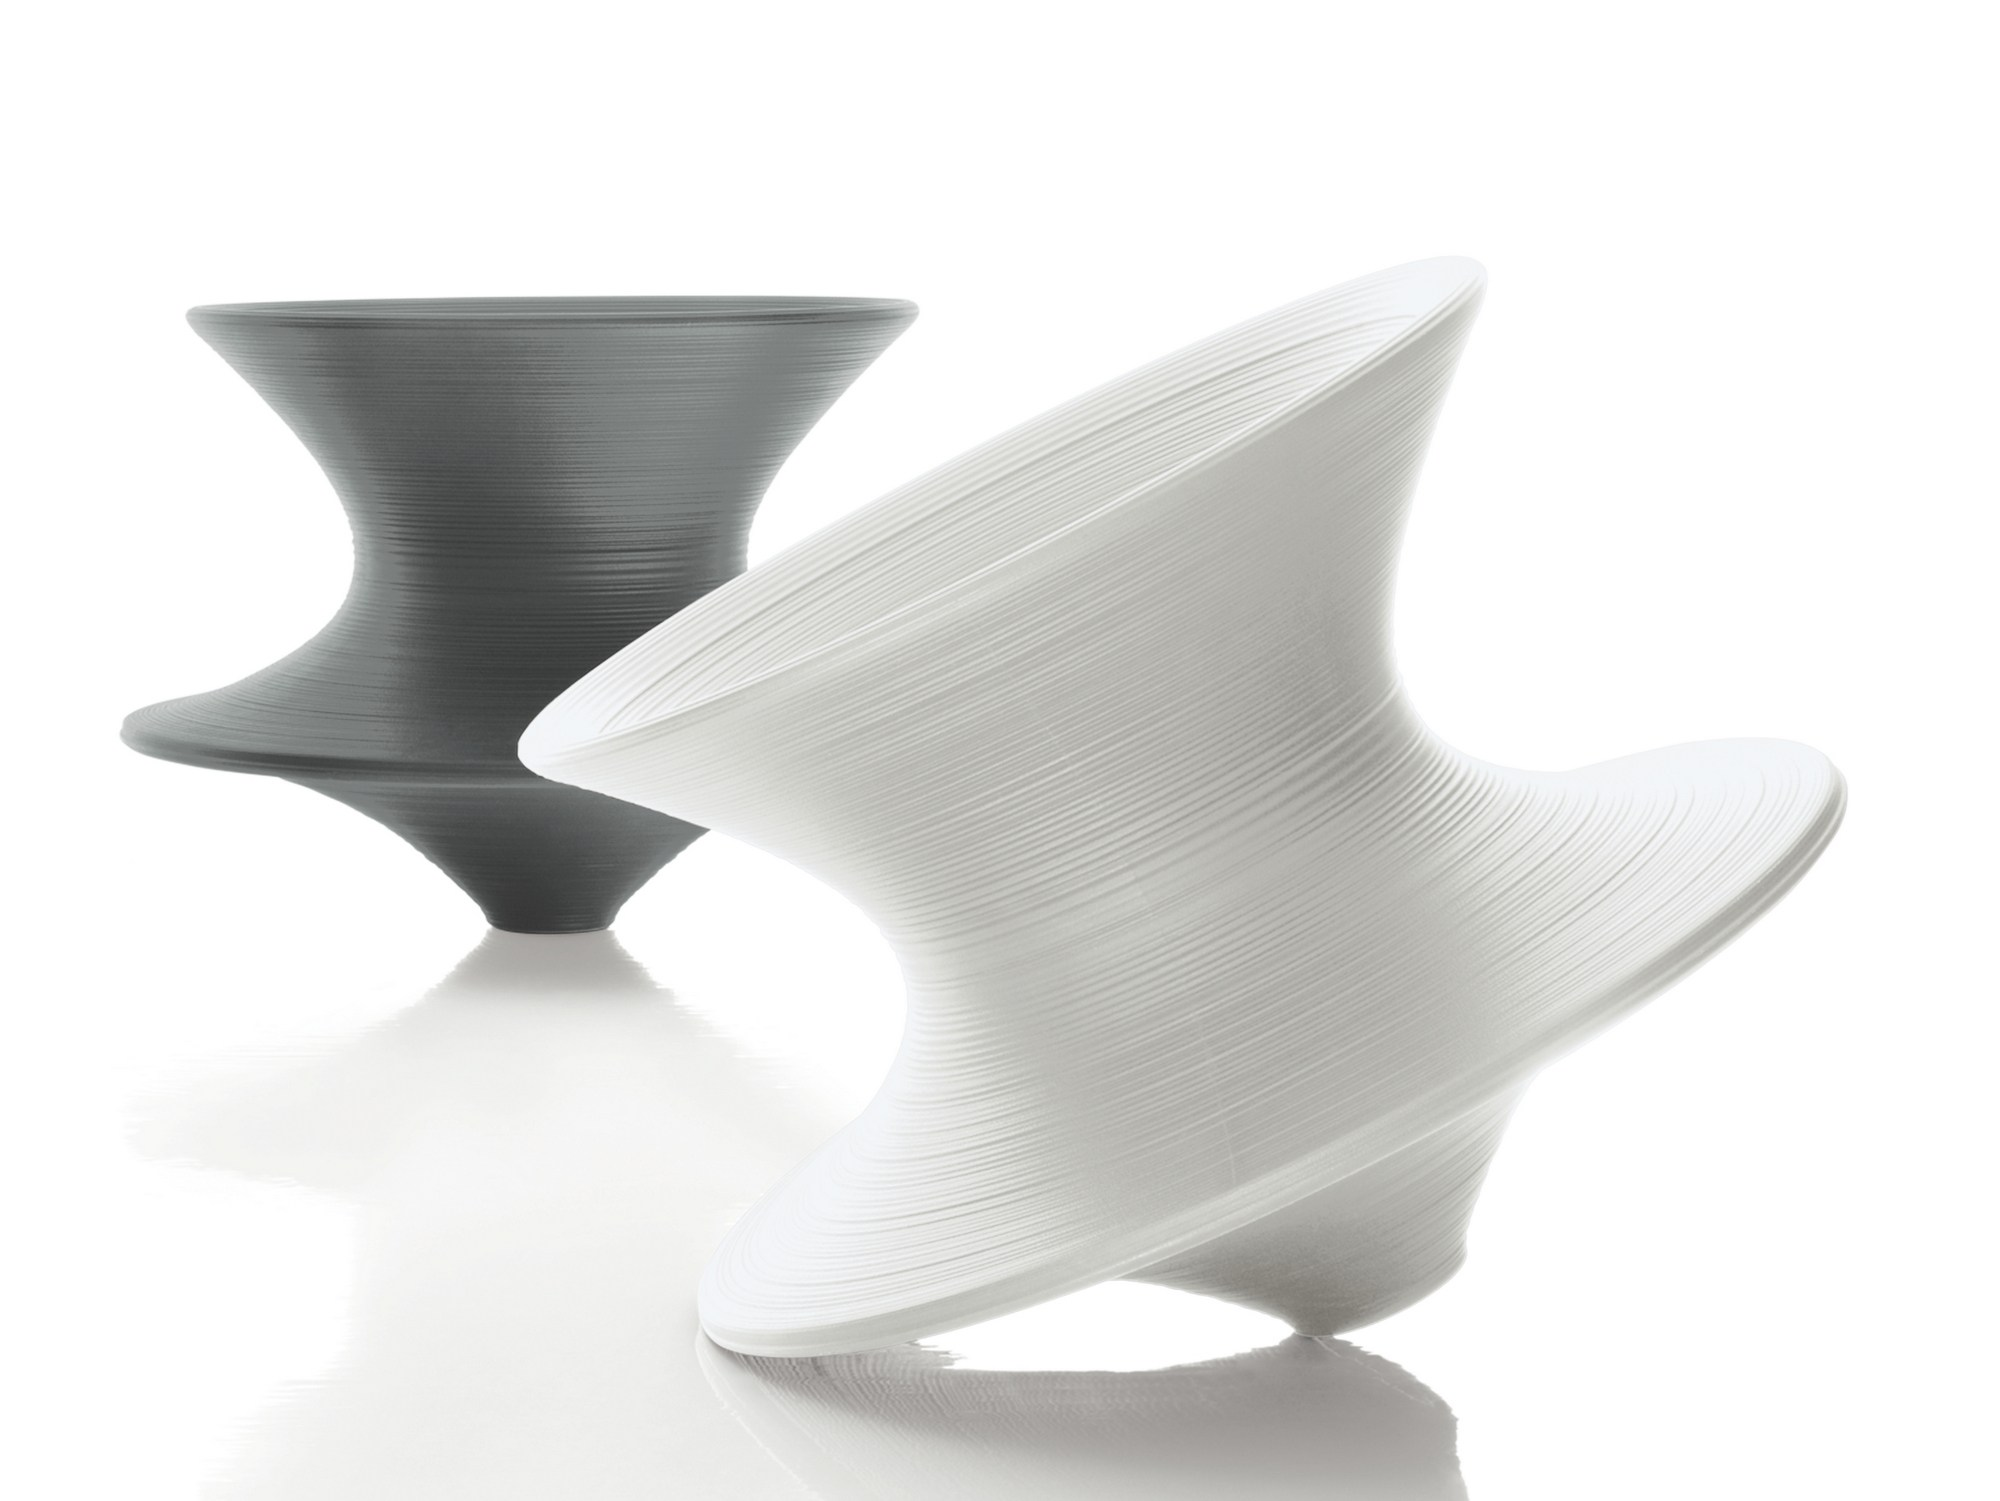 Polyethylene armchair spun by magis design thomas heatherwick for Magis design